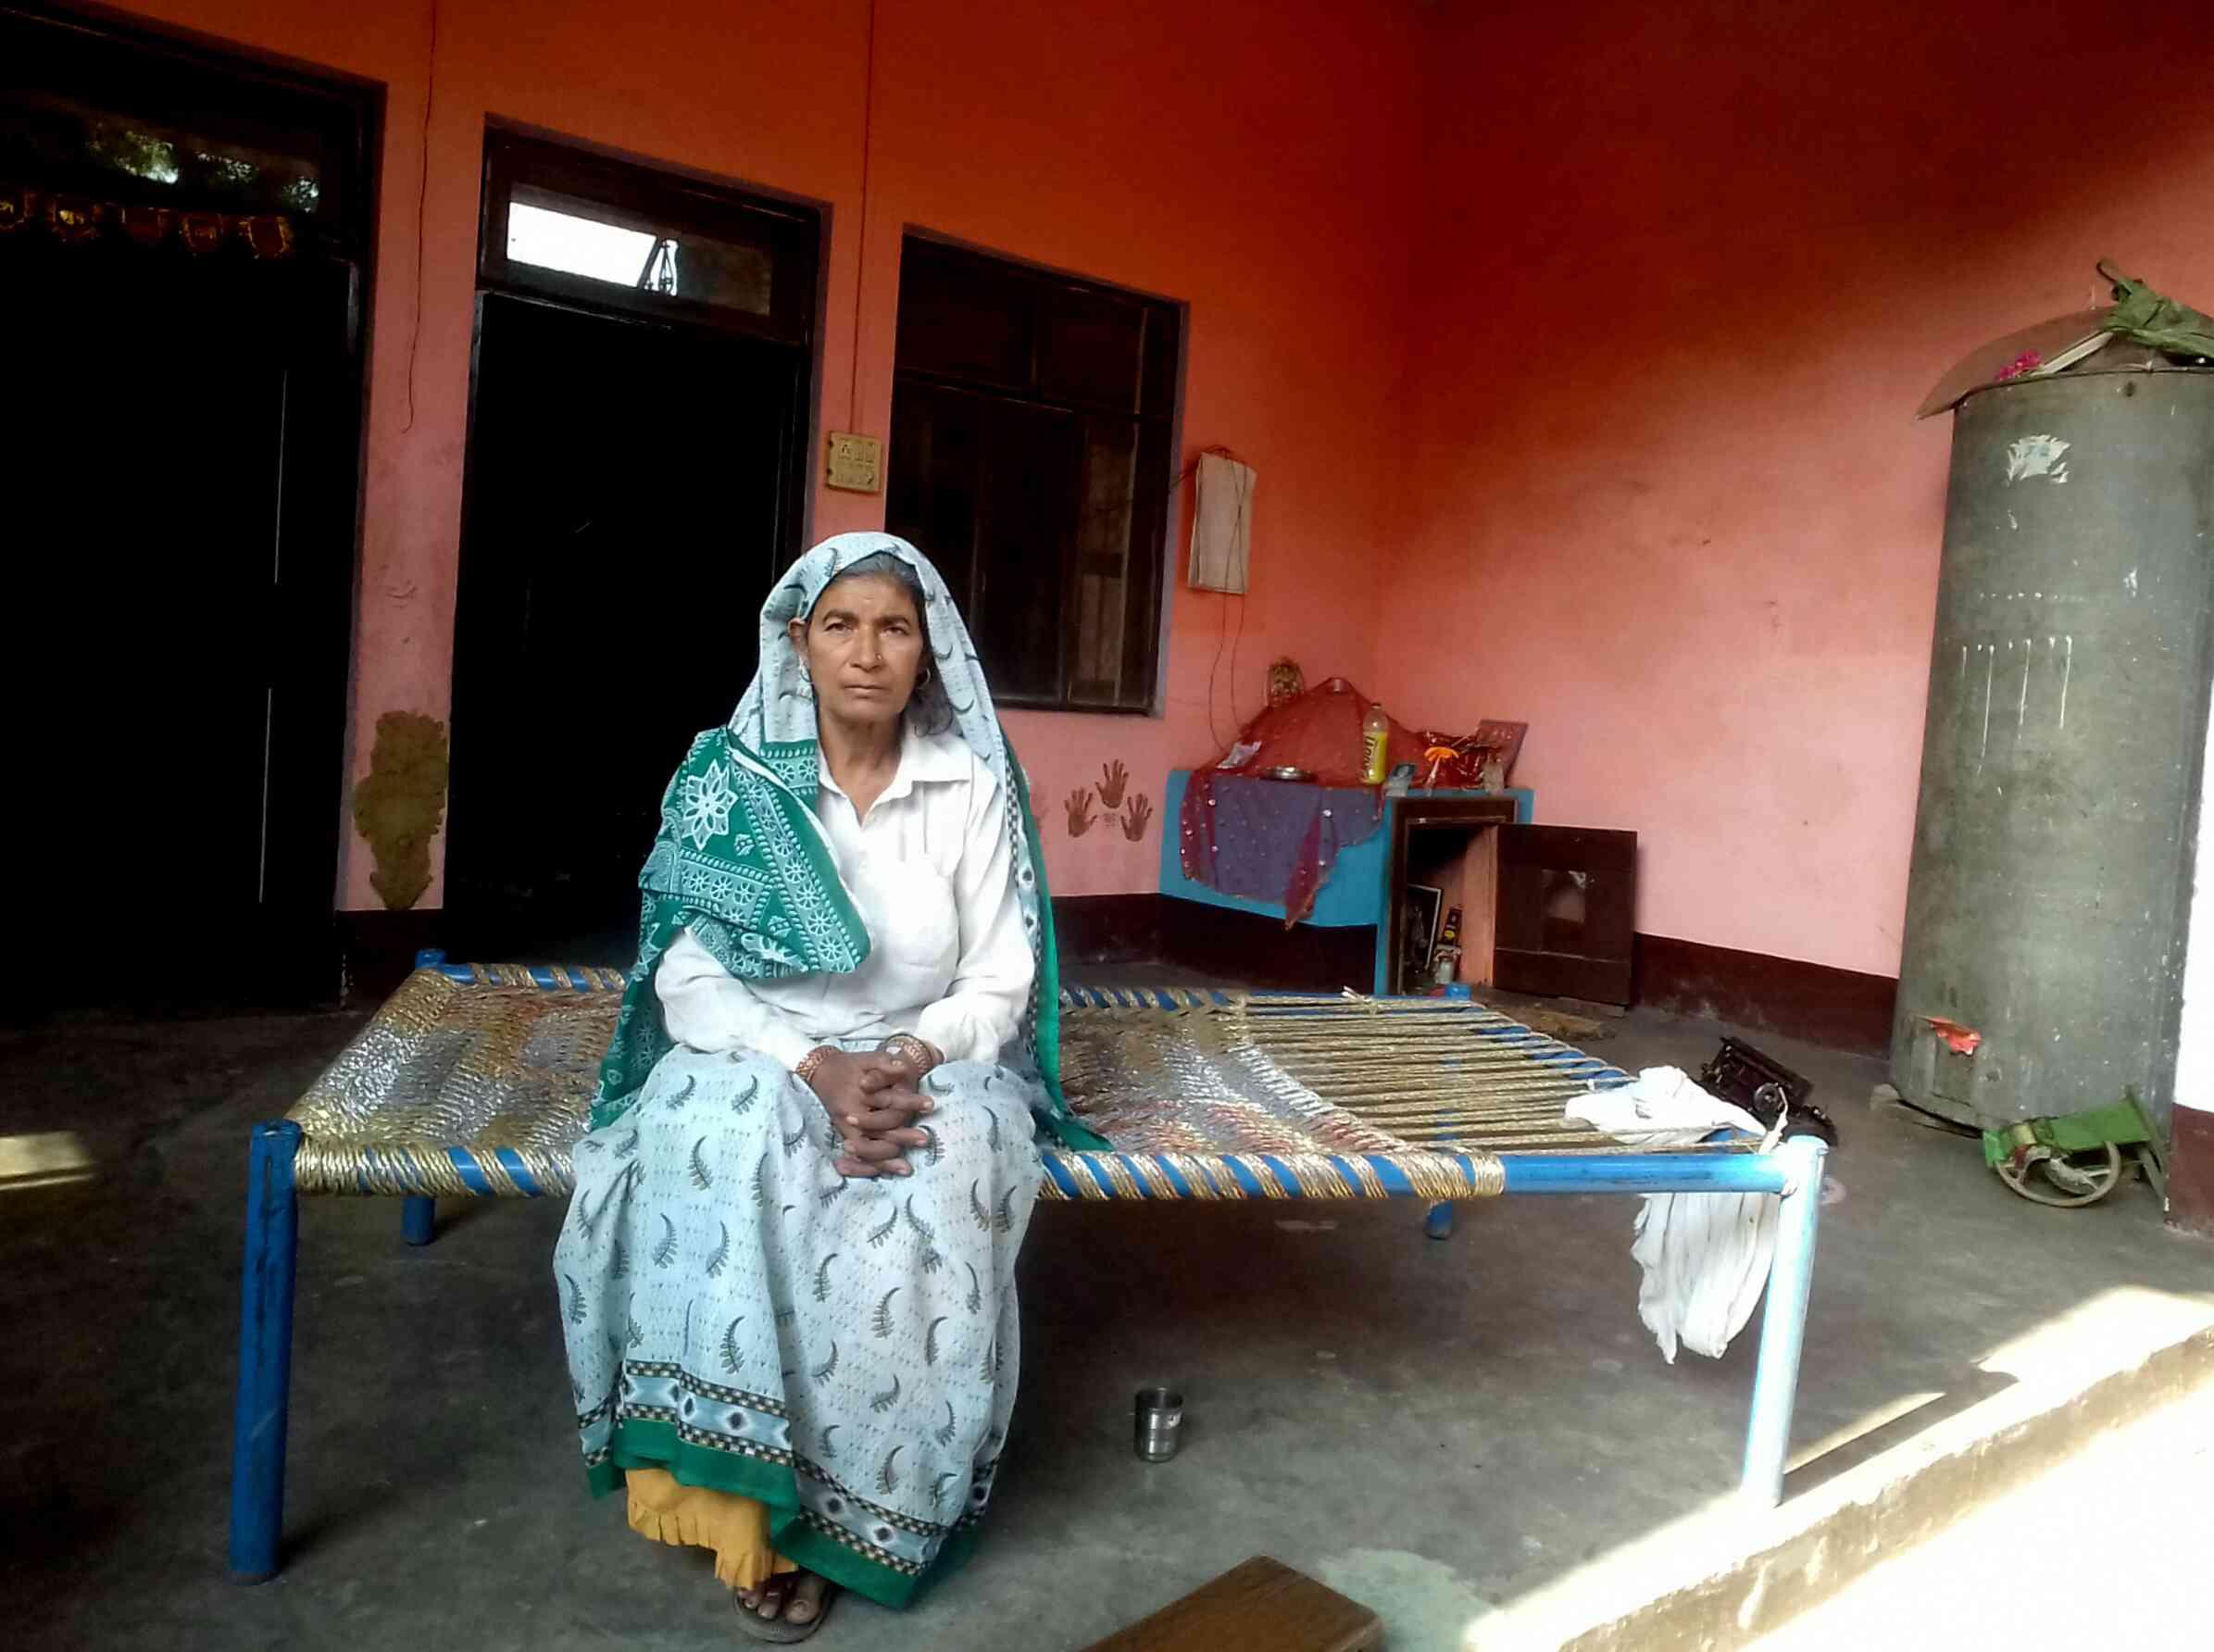 Jitendra Malik's mother Ratan Kaur at their home in Mahaw village, Bulandshahr. Photo credit: Abhishek Dey